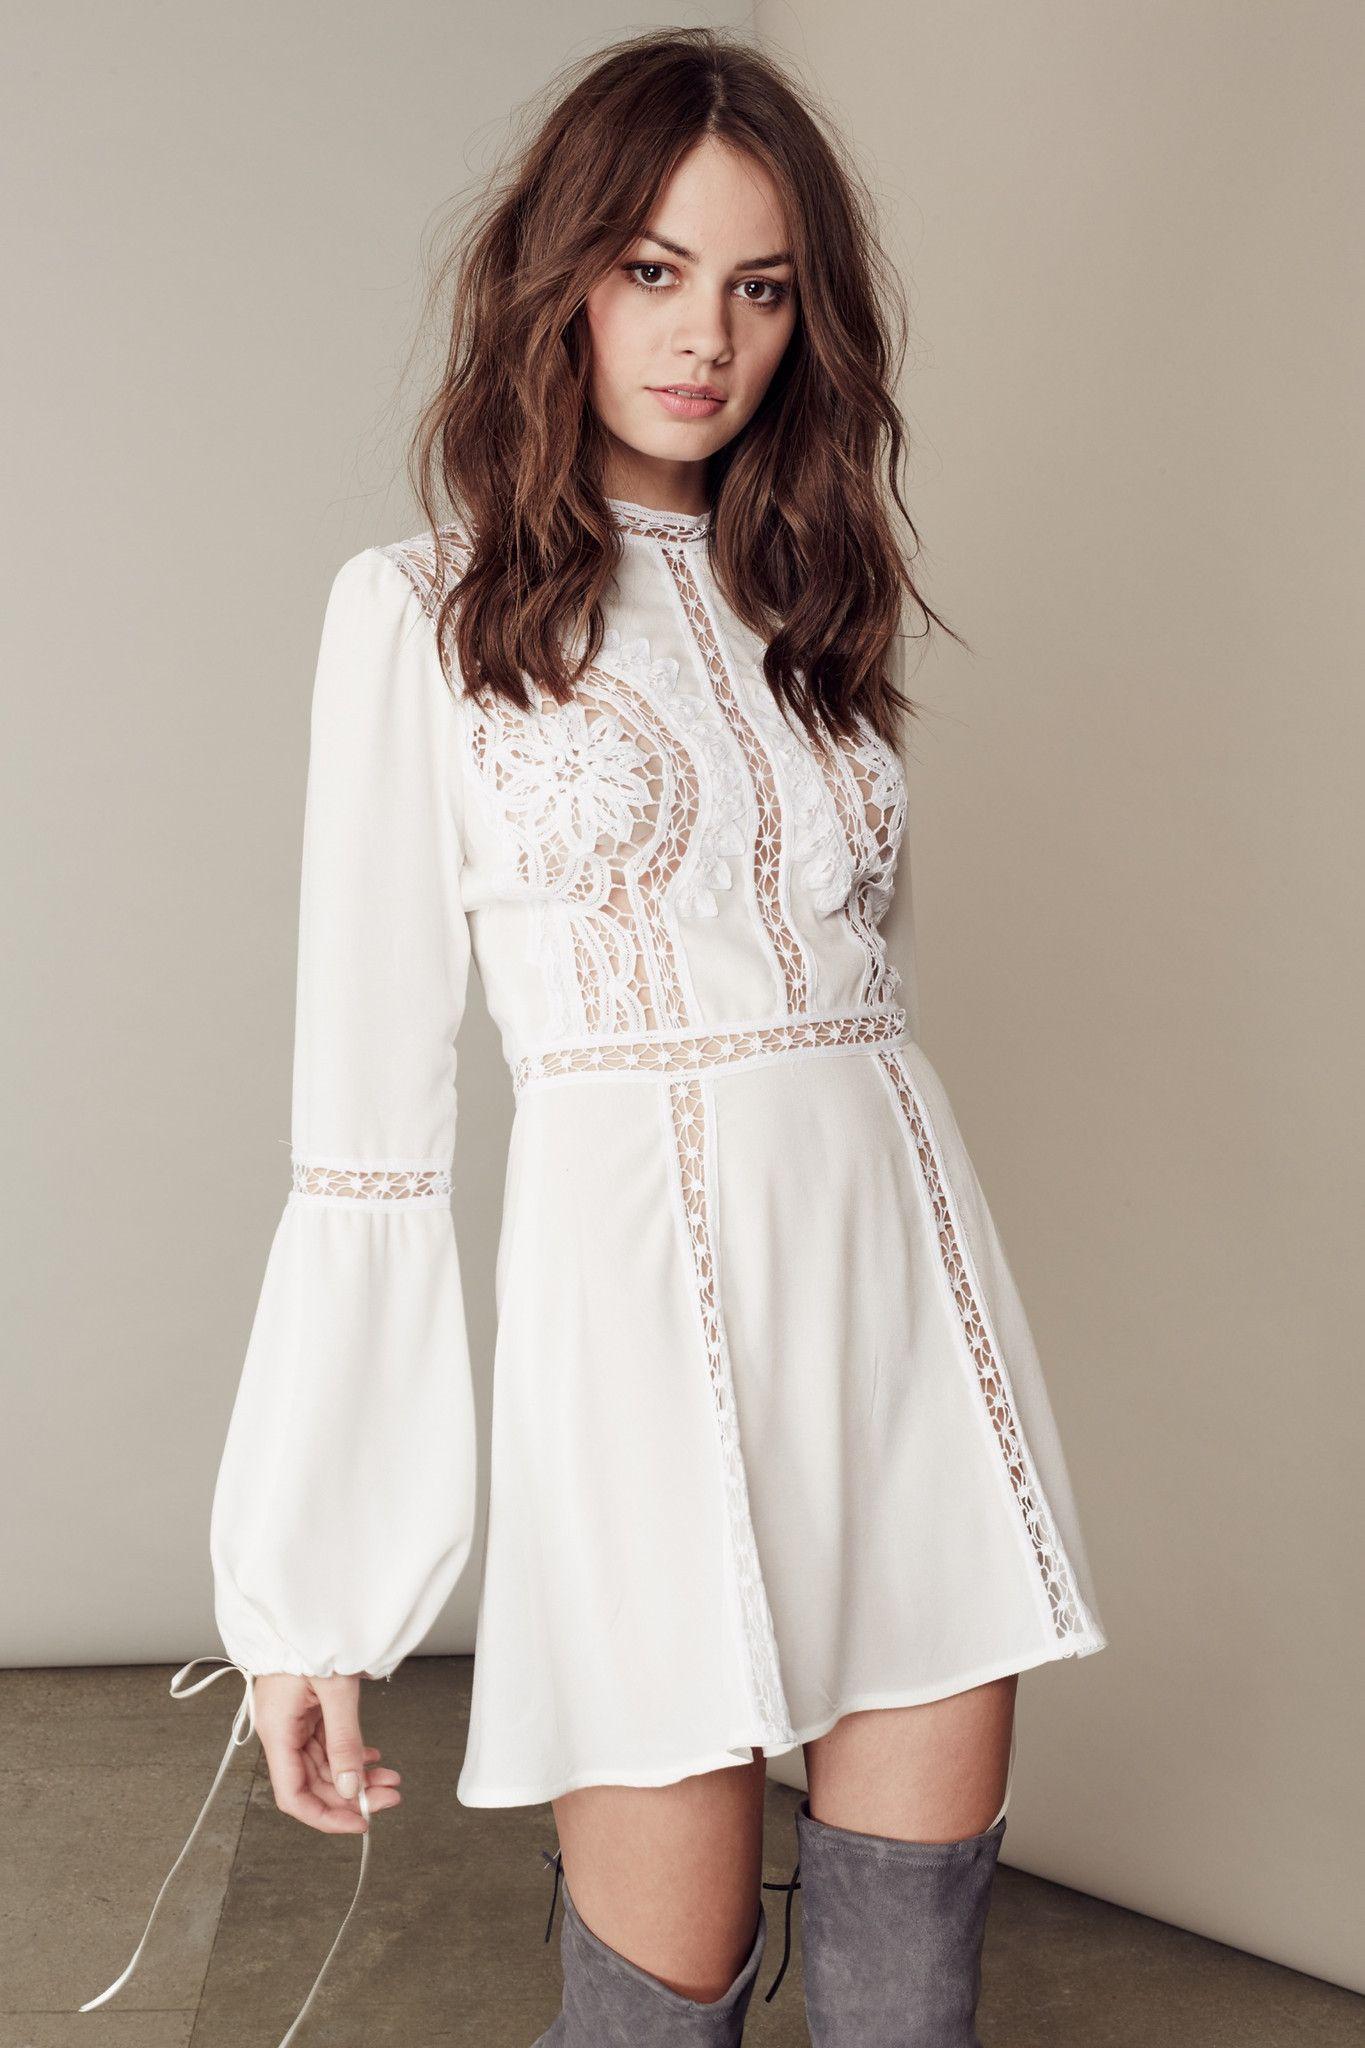 Idealna Letnia Sukienka Early Days 80 86 1 2 Lat Wiosna Kwiaty Impreza Wesele In 2020 Summer Dresses Floral Tops Dresses